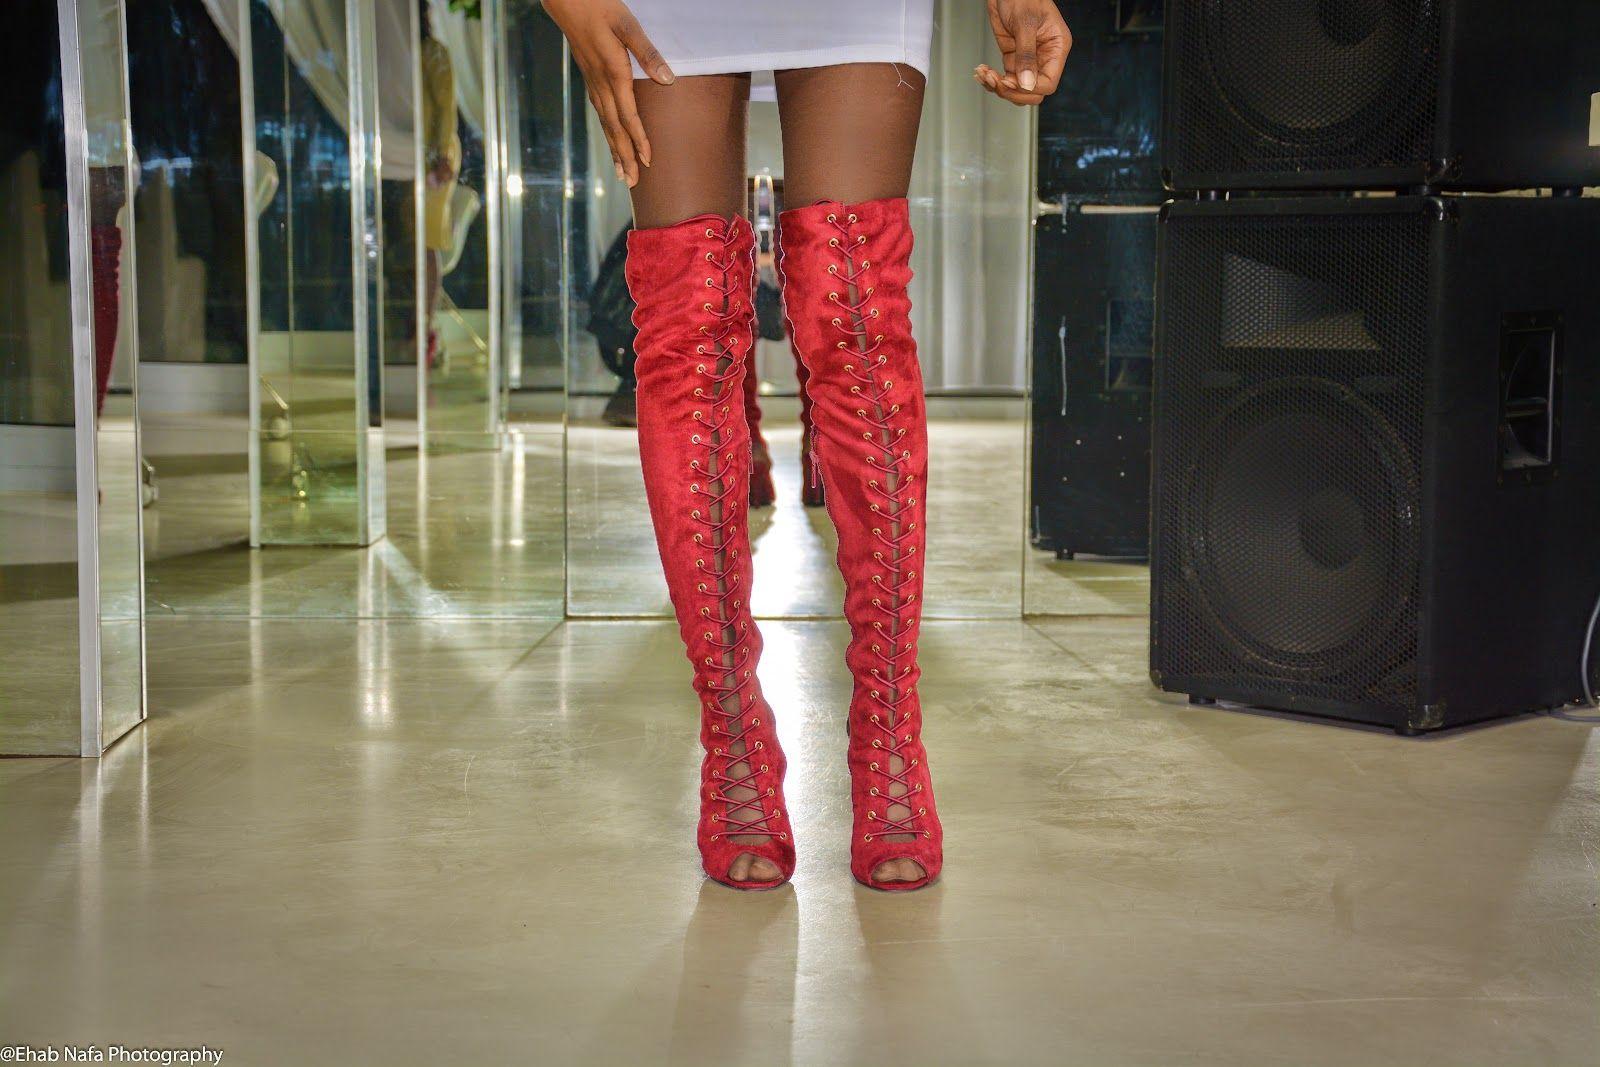 BIRTHDAY DINNER WITH DOUEBI ~ MÉLÒDÝ JACÒB'S #laceupboot #highkneelboots #kneelhighboots #boots #burgundy #longboots #inspirations #blogger #fashionblogger #white #party #now #shortdress